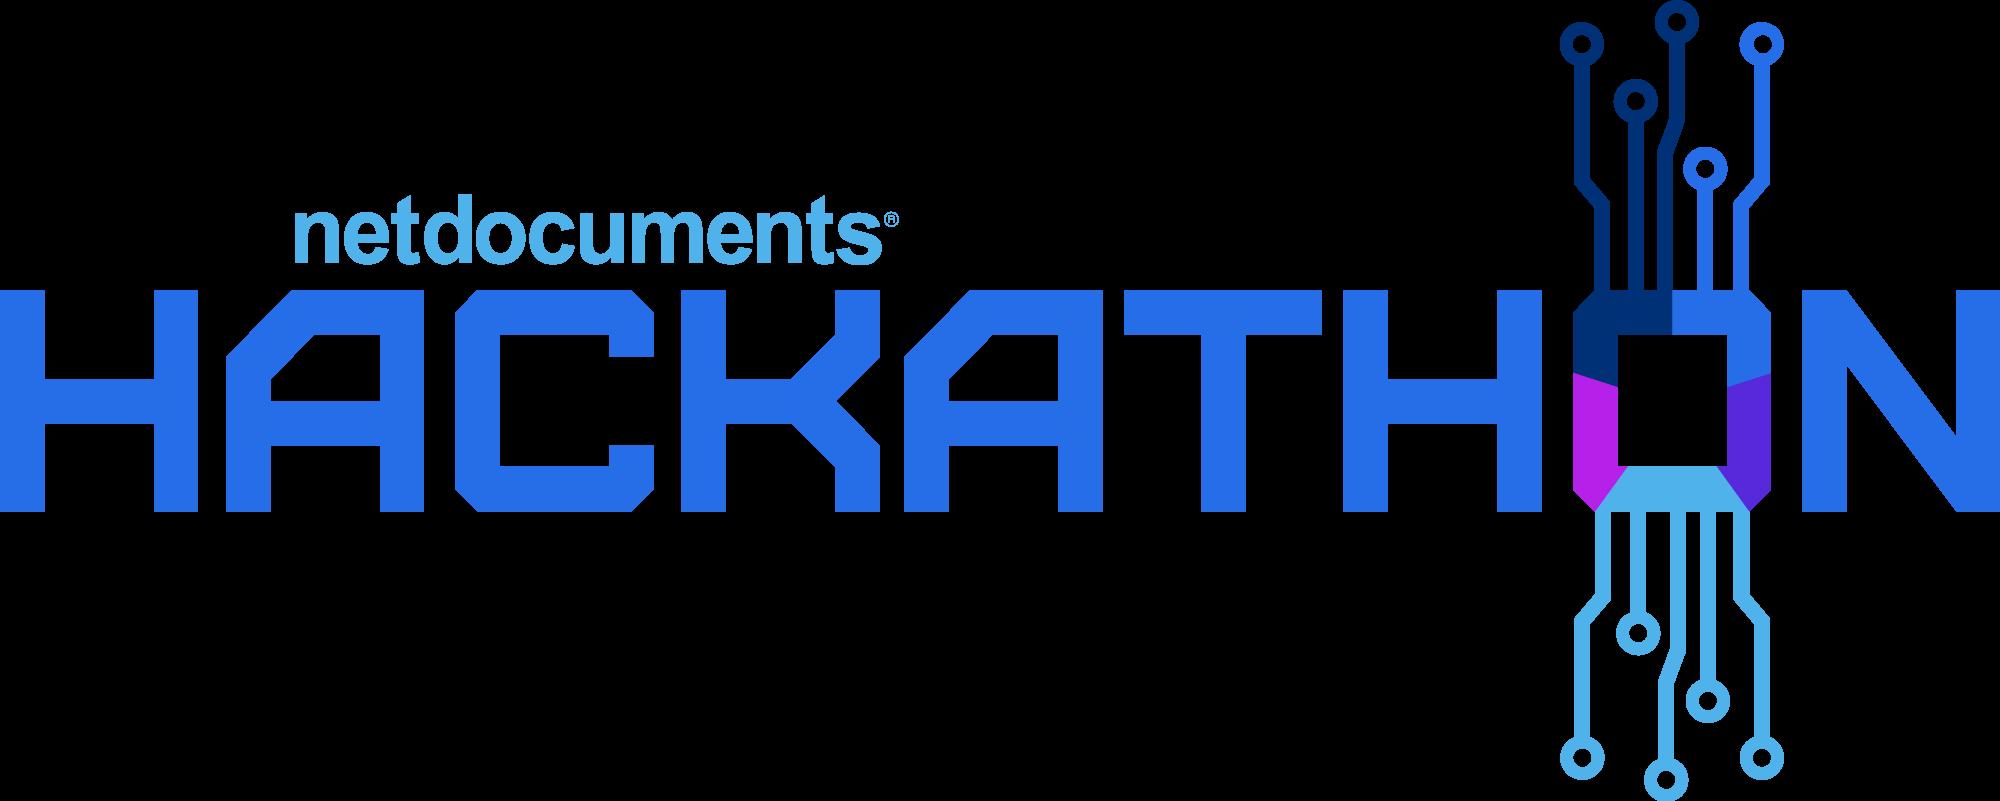 NetDocuments 2021 Hackathon Logo.